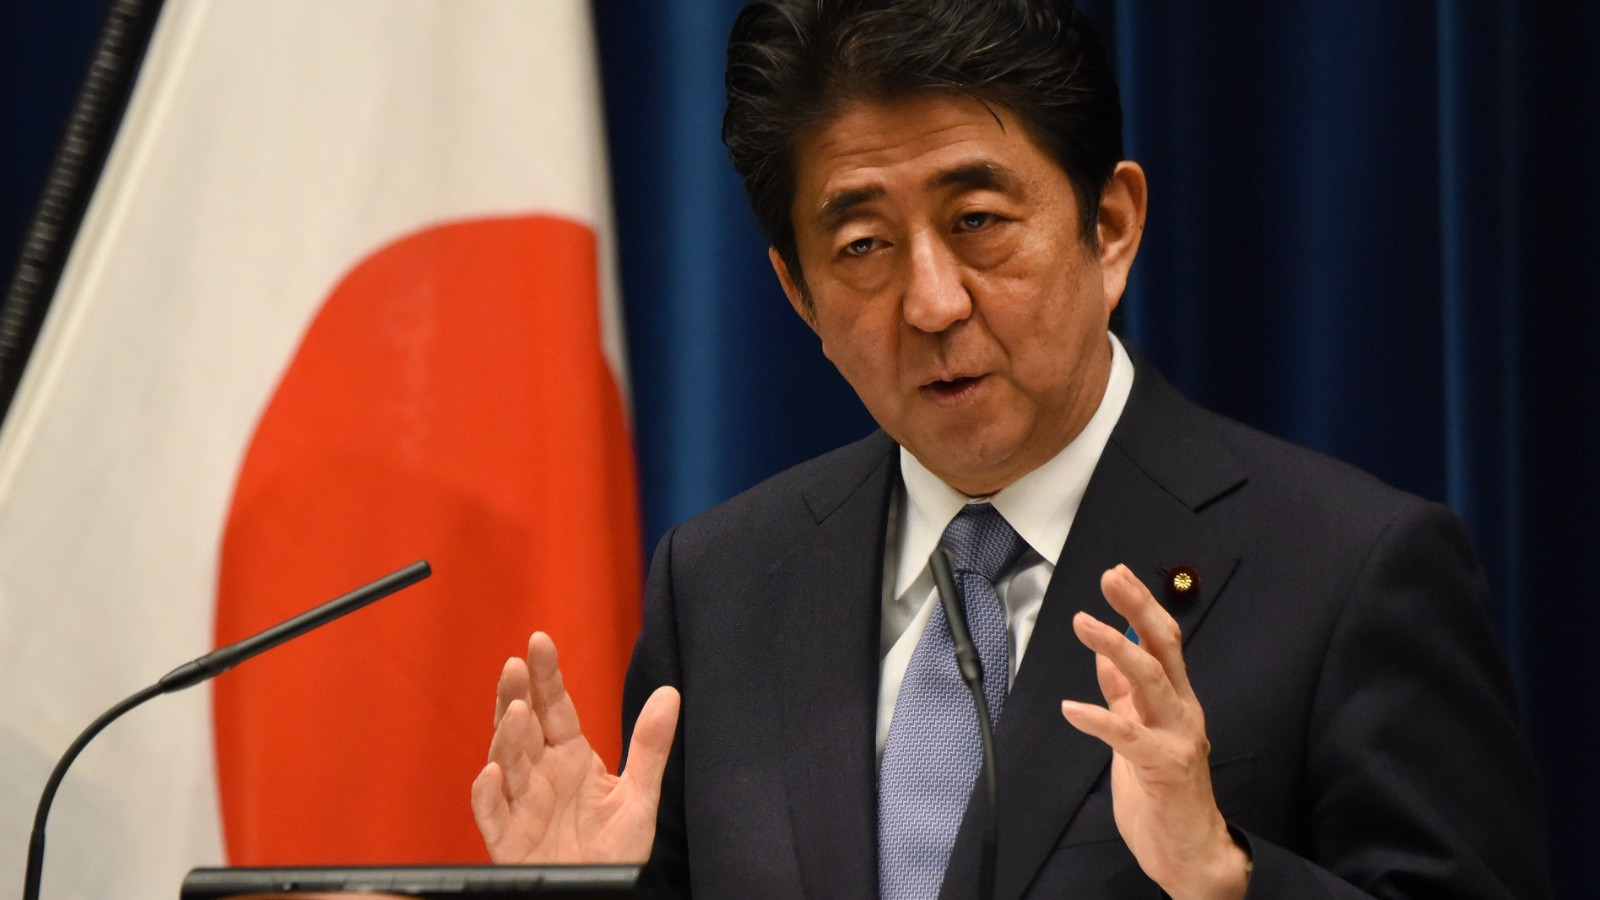 Japan's Shinzō Abe to visit Bulgaria in mid-January